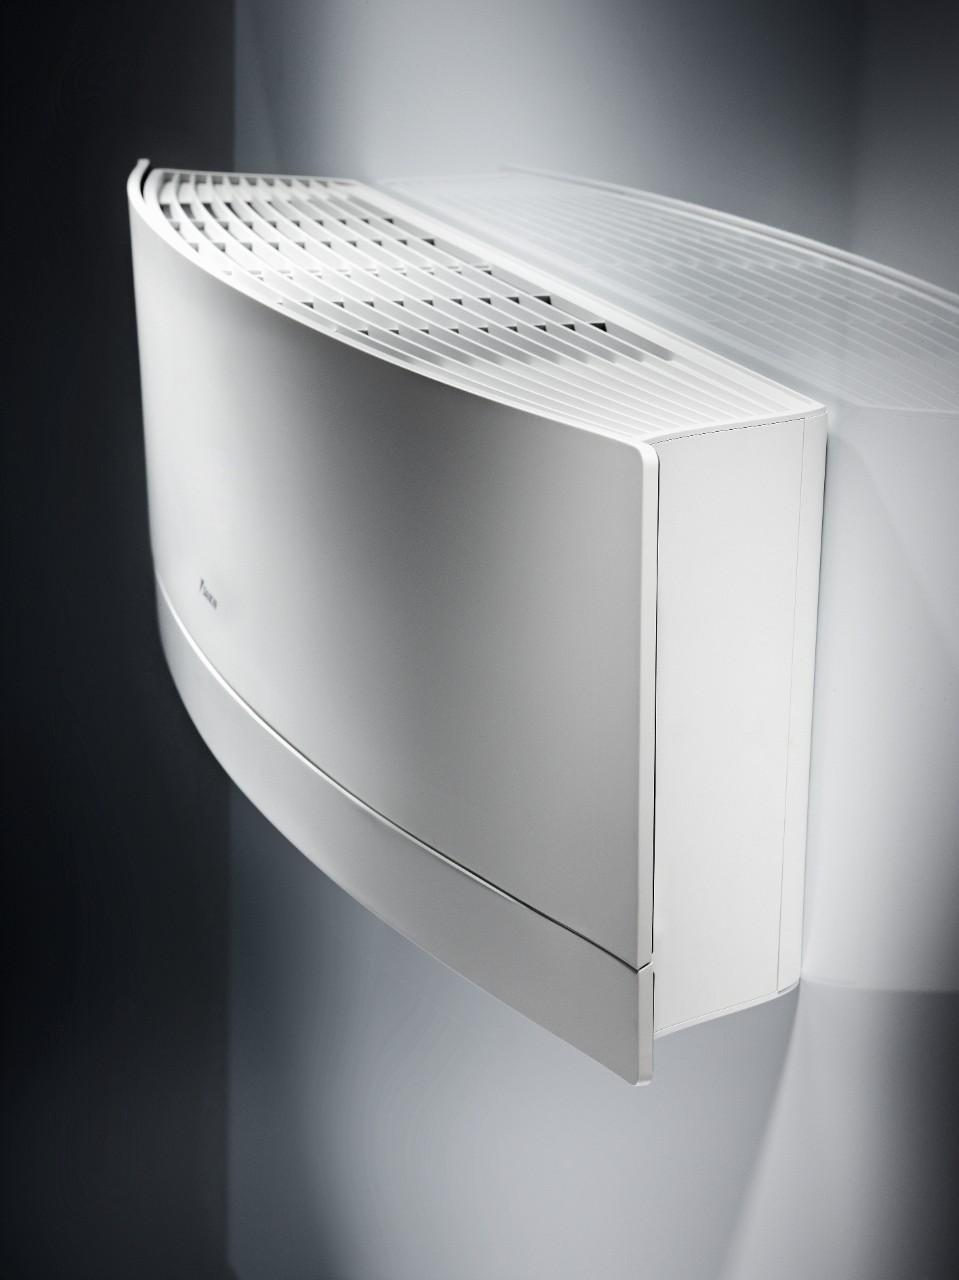 Climatiseur trisplit réversible inverter DAIKIN 3MXM68N.